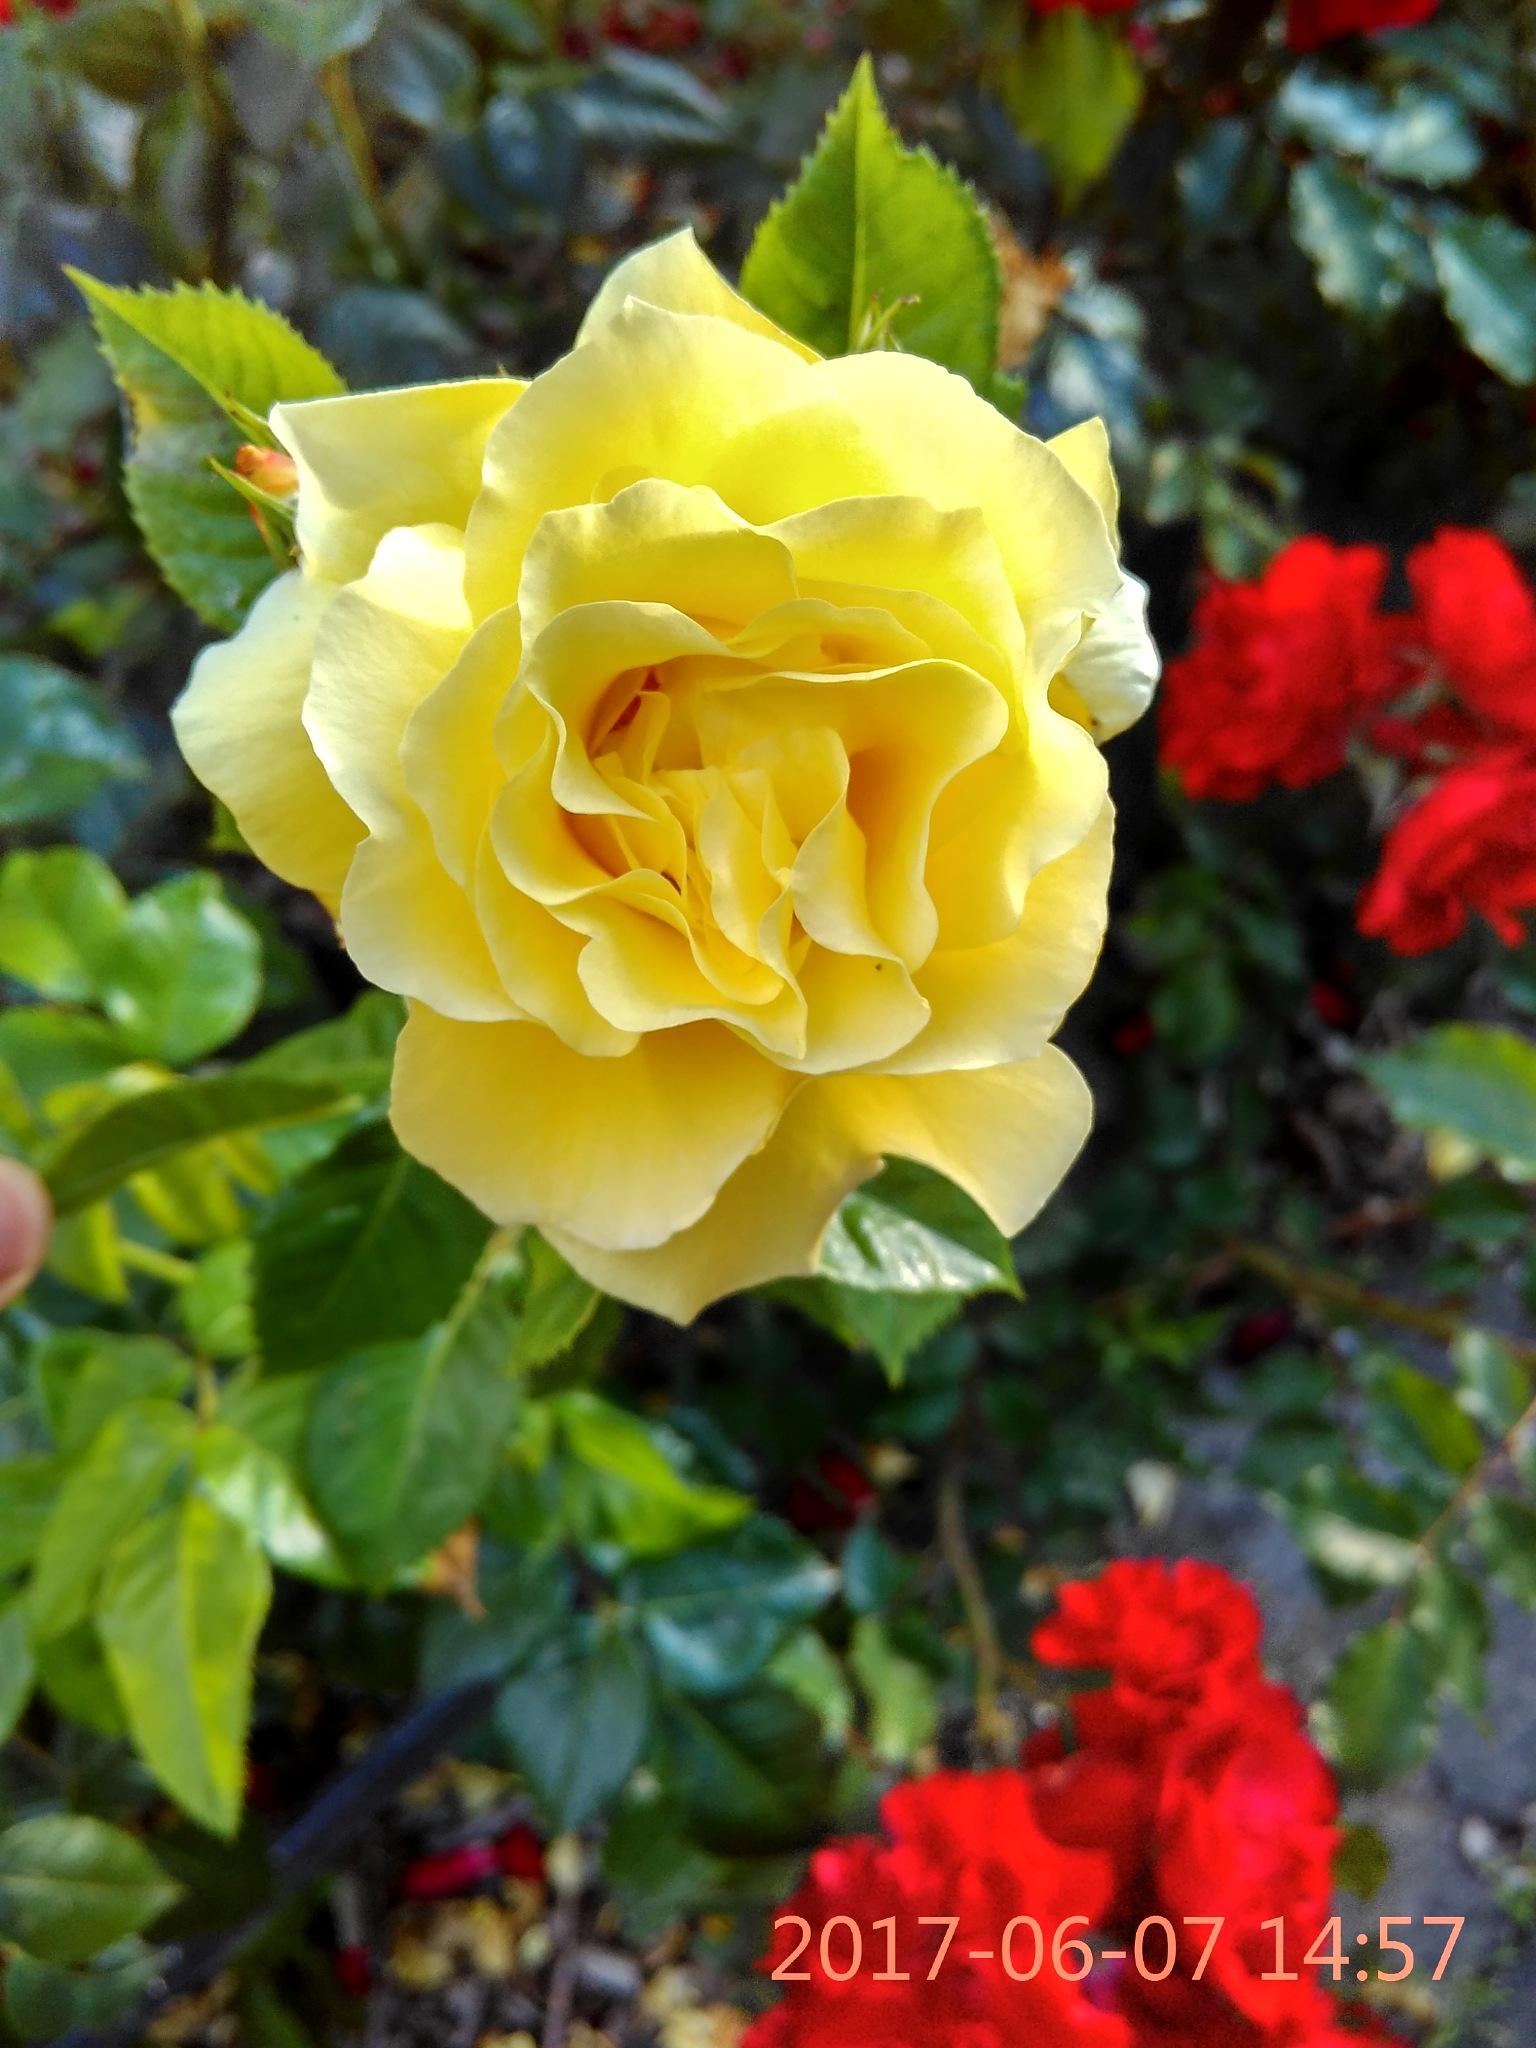 Flower by miriam.moura